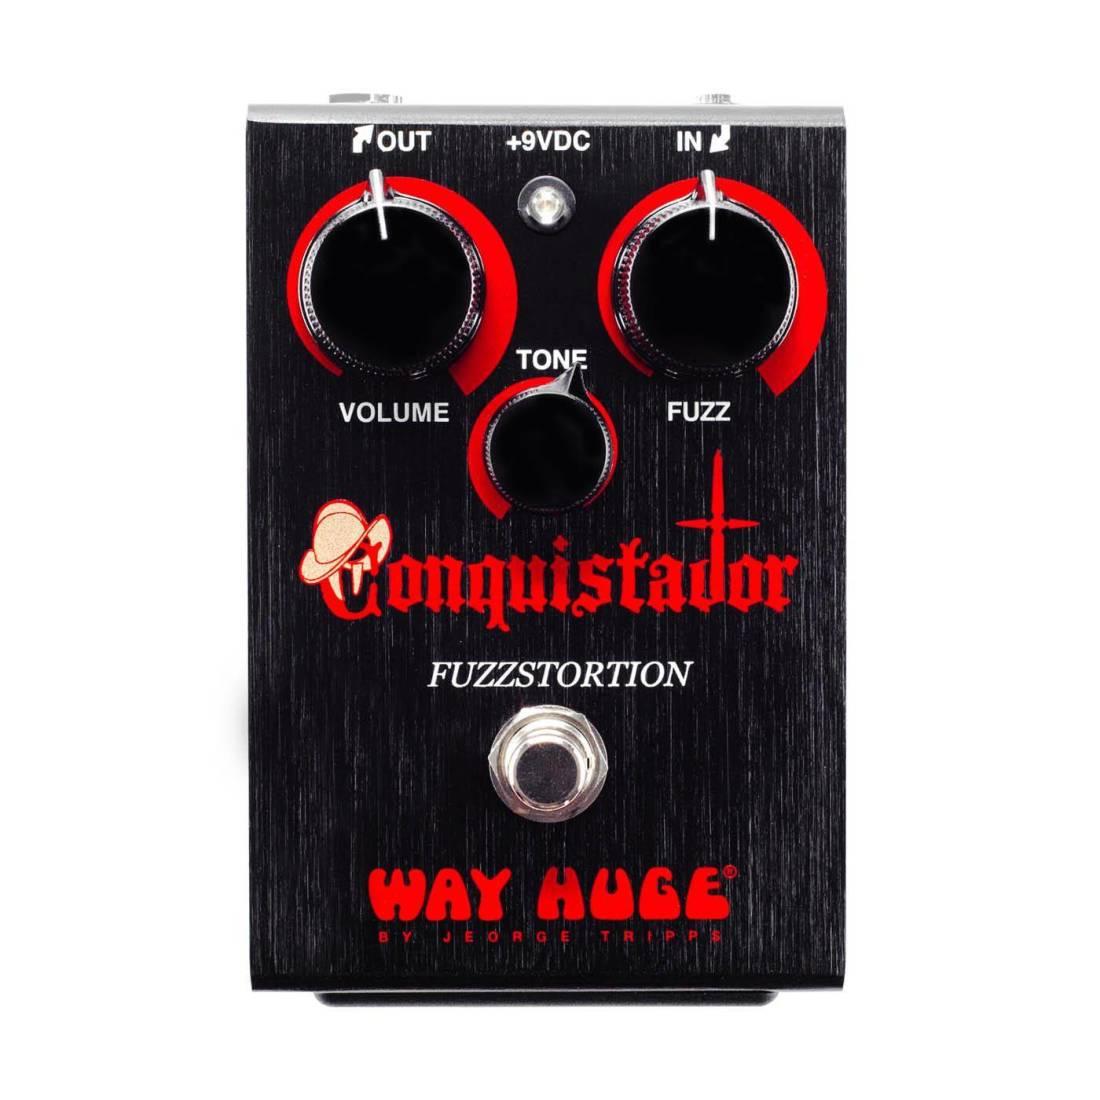 Way Huge Electronics Conquistador Fuzzstortion Long Mcquade Jimmy Hendrix Fuzz Face Guitar Effect Schematic Diagram